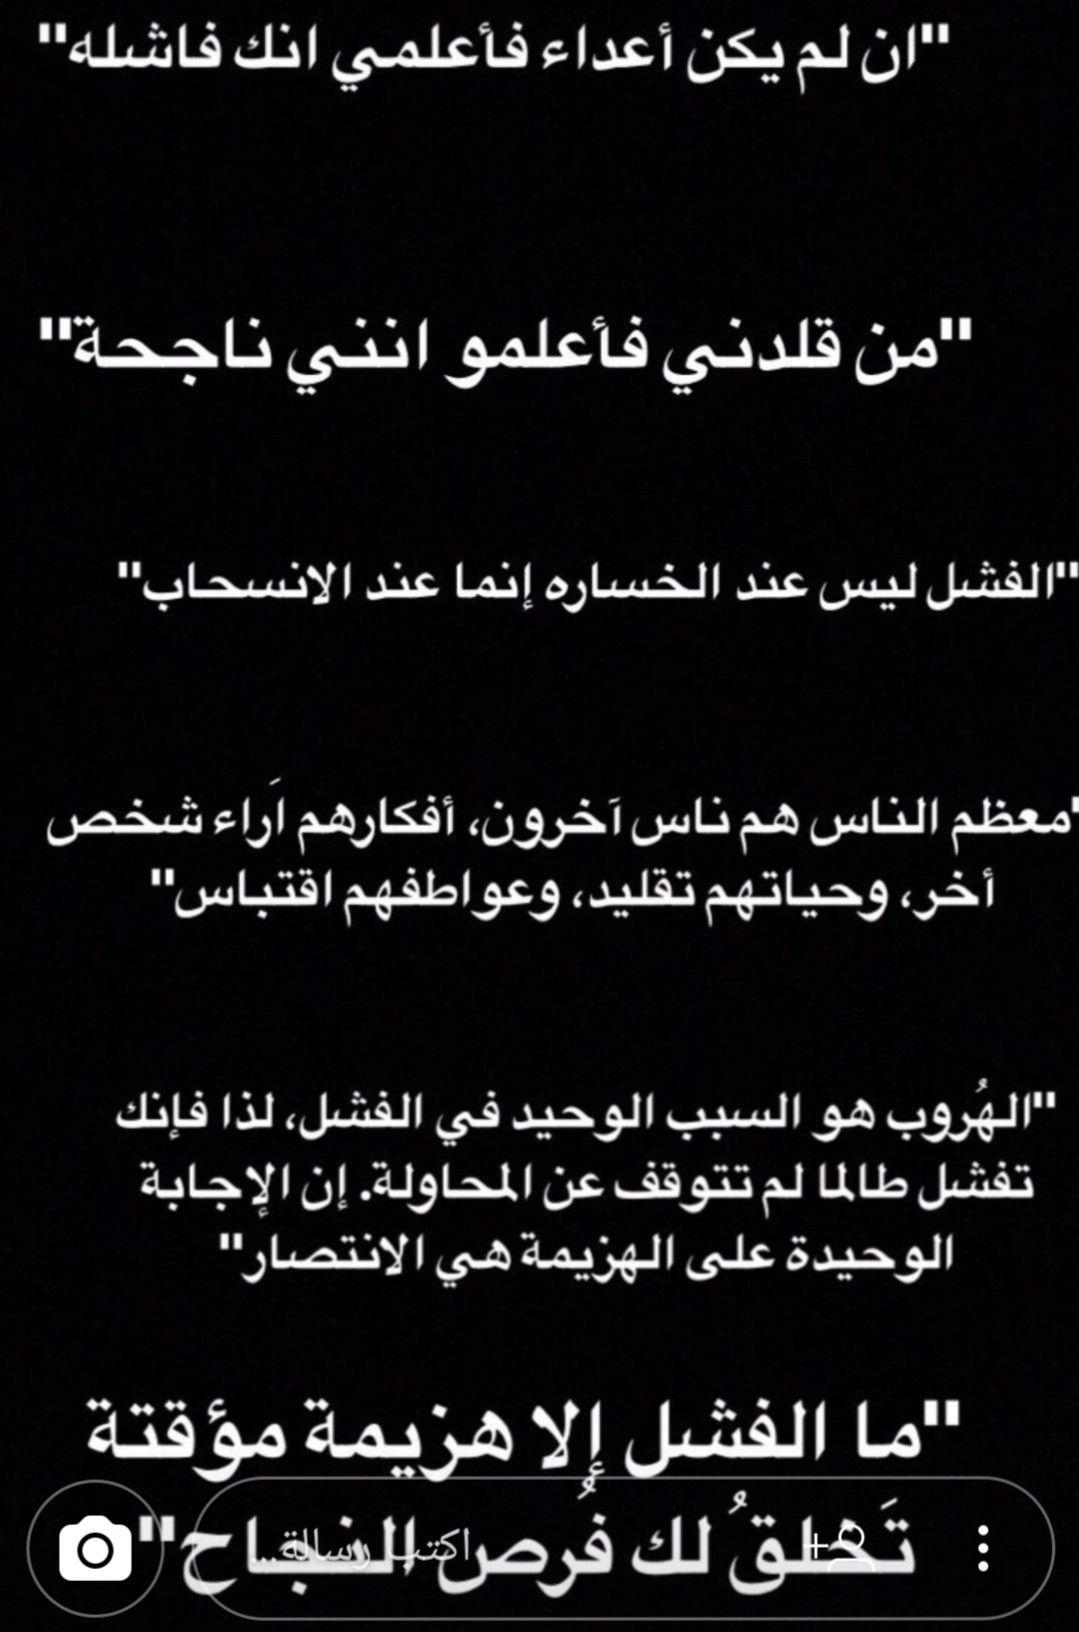 Pin By F A T M A On كـلام Math Arabic Calligraphy Calligraphy